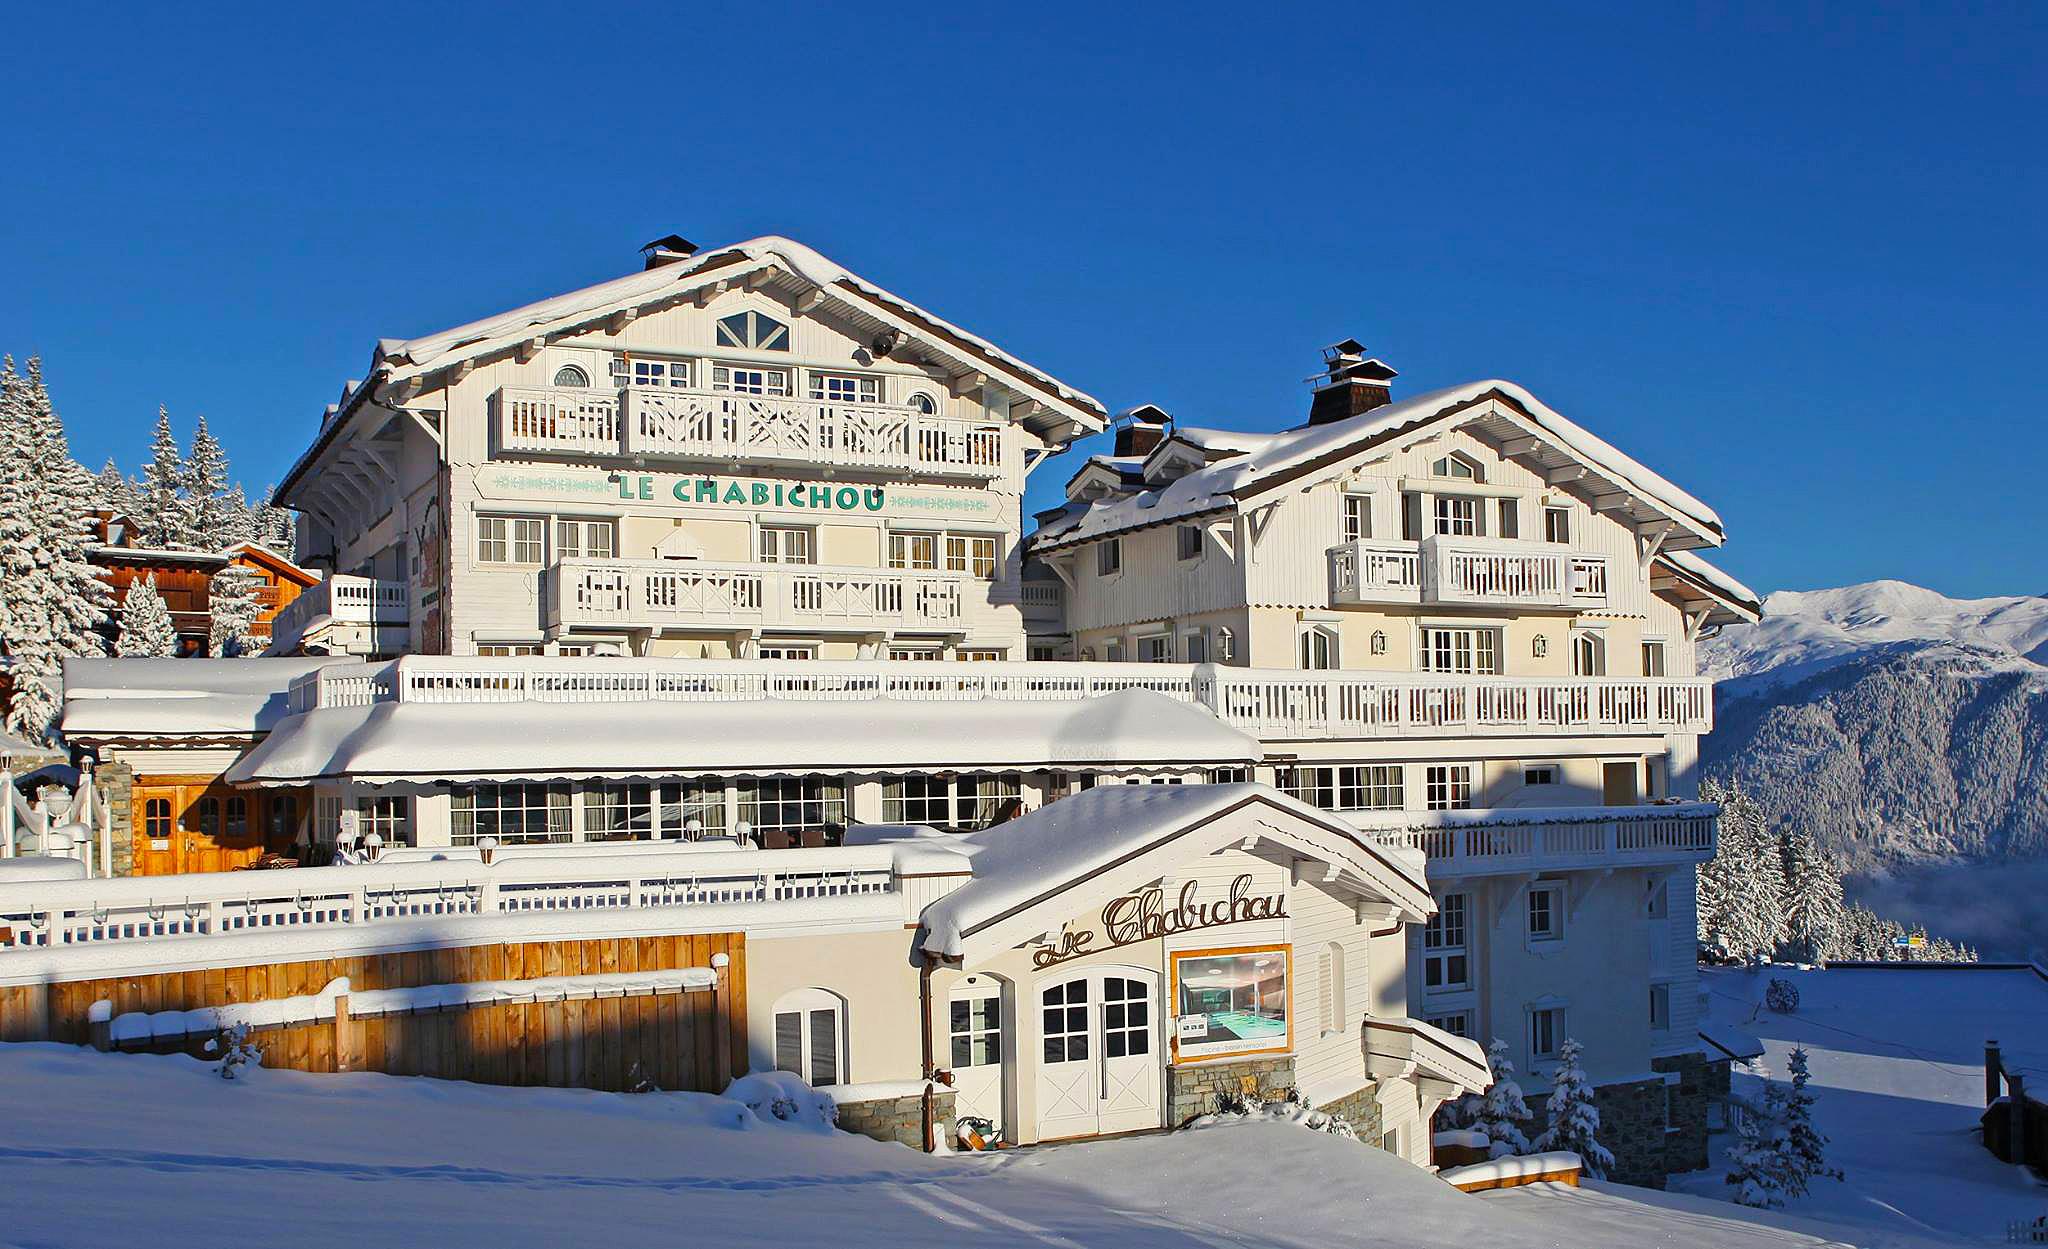 Five-star mountain resort luxury at Le Chabichou Hôtel, Courchevel, France